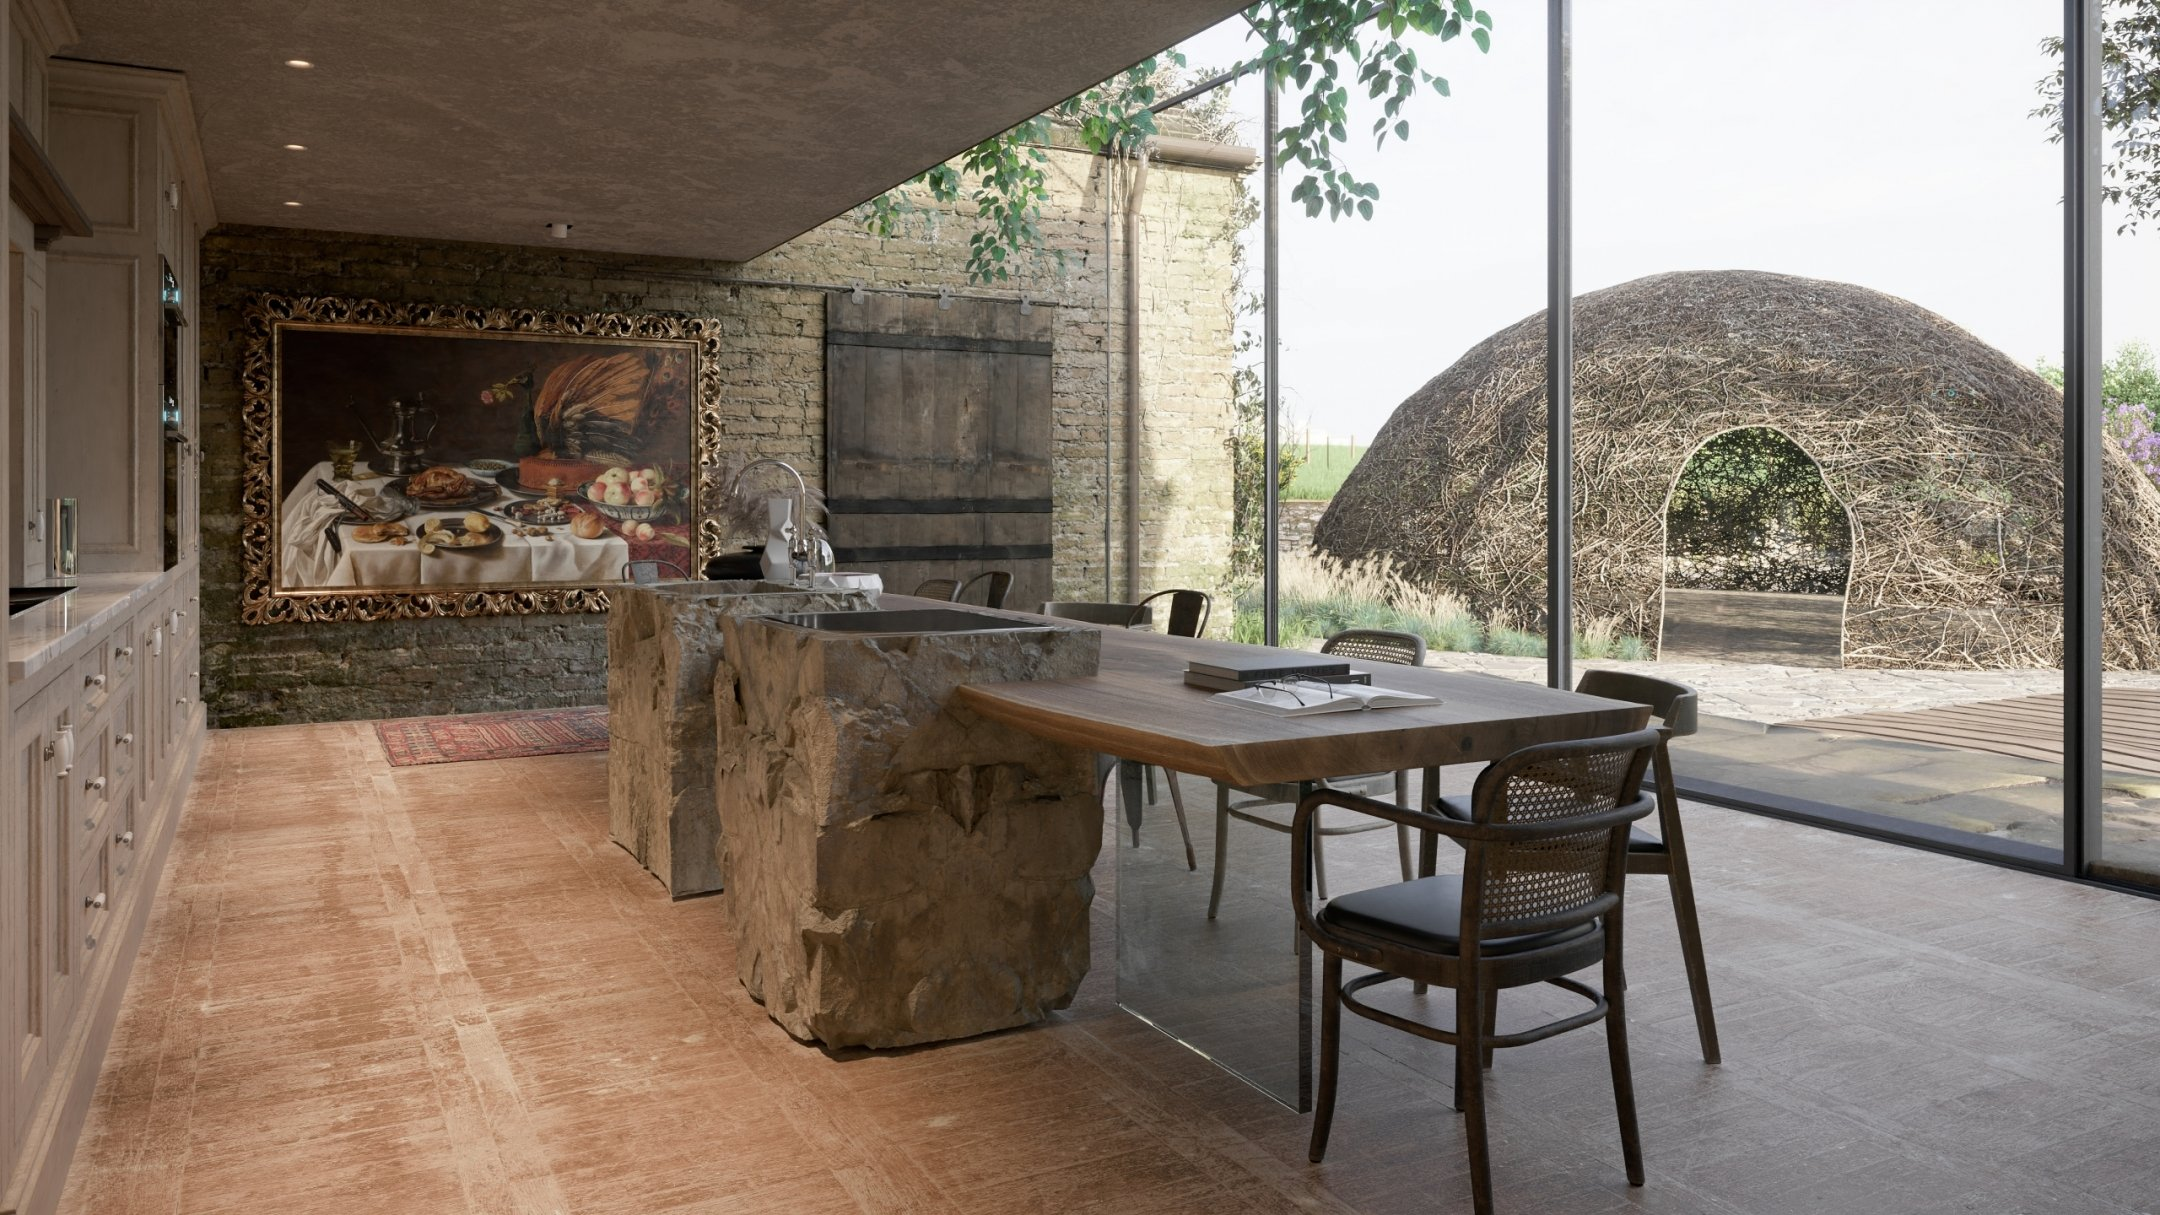 CG Visualization Showing a Luxurious Kitchen Design